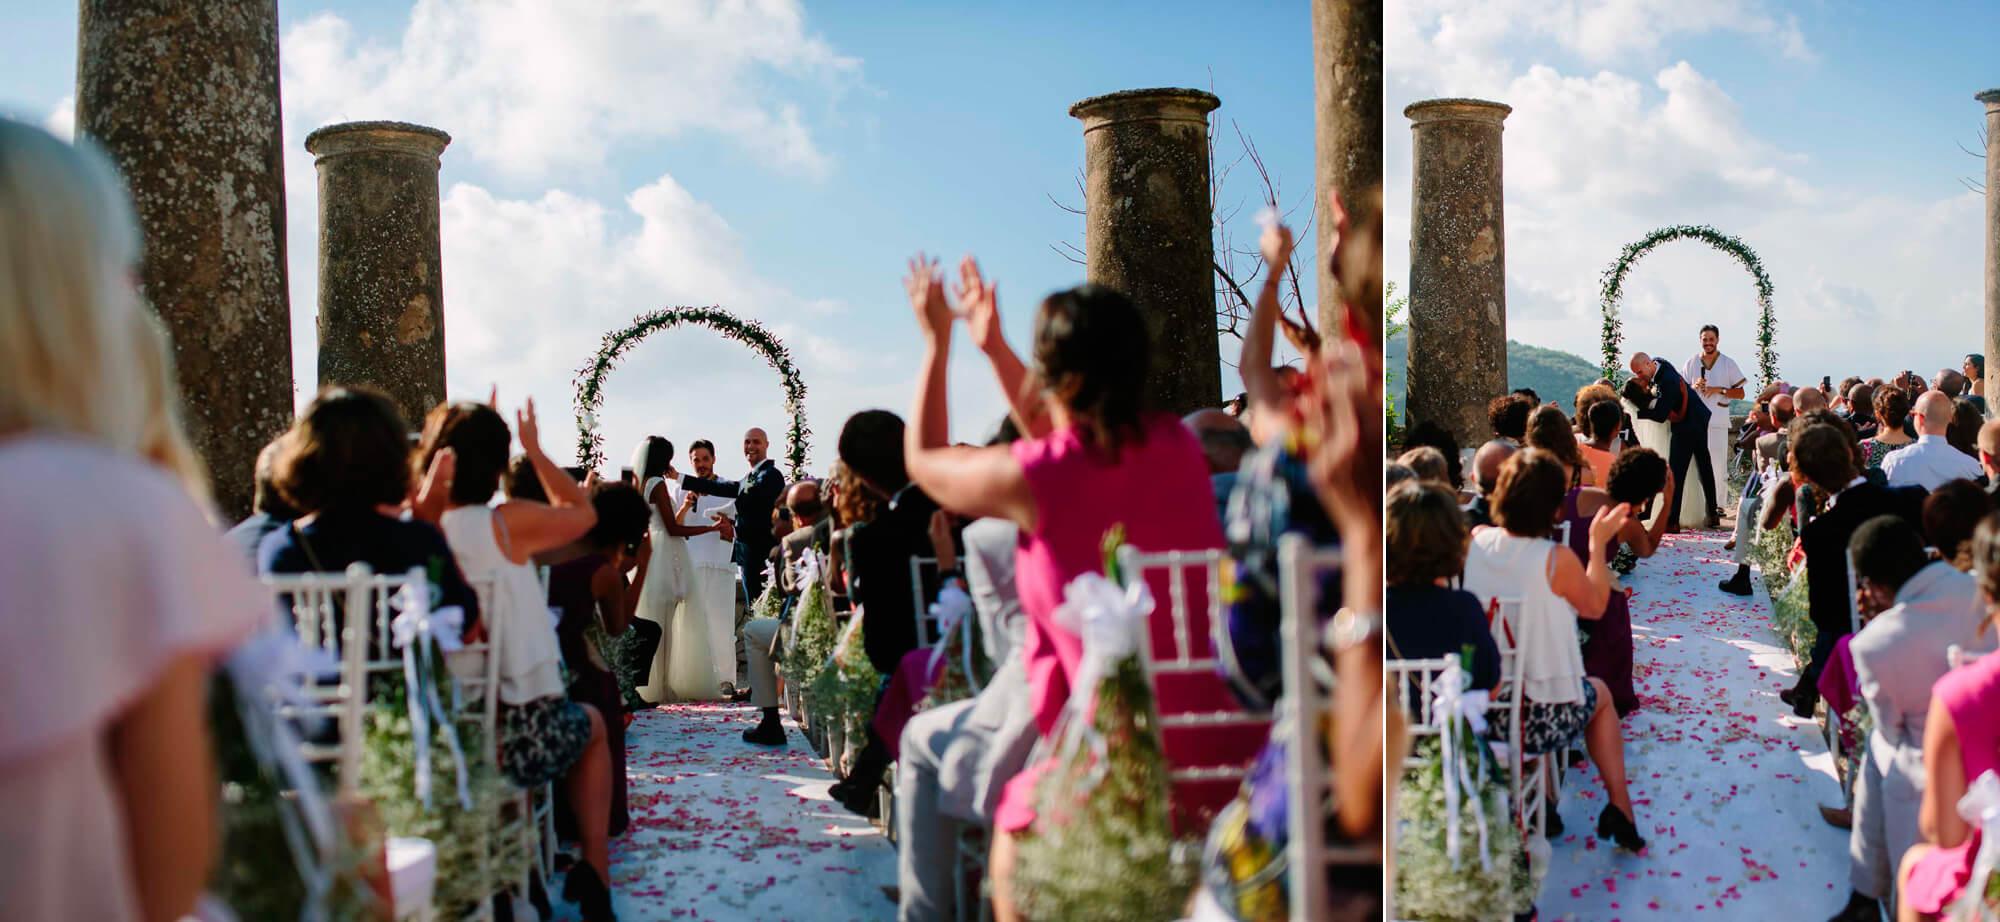 070-sorrento-wedding-photographer.jpg